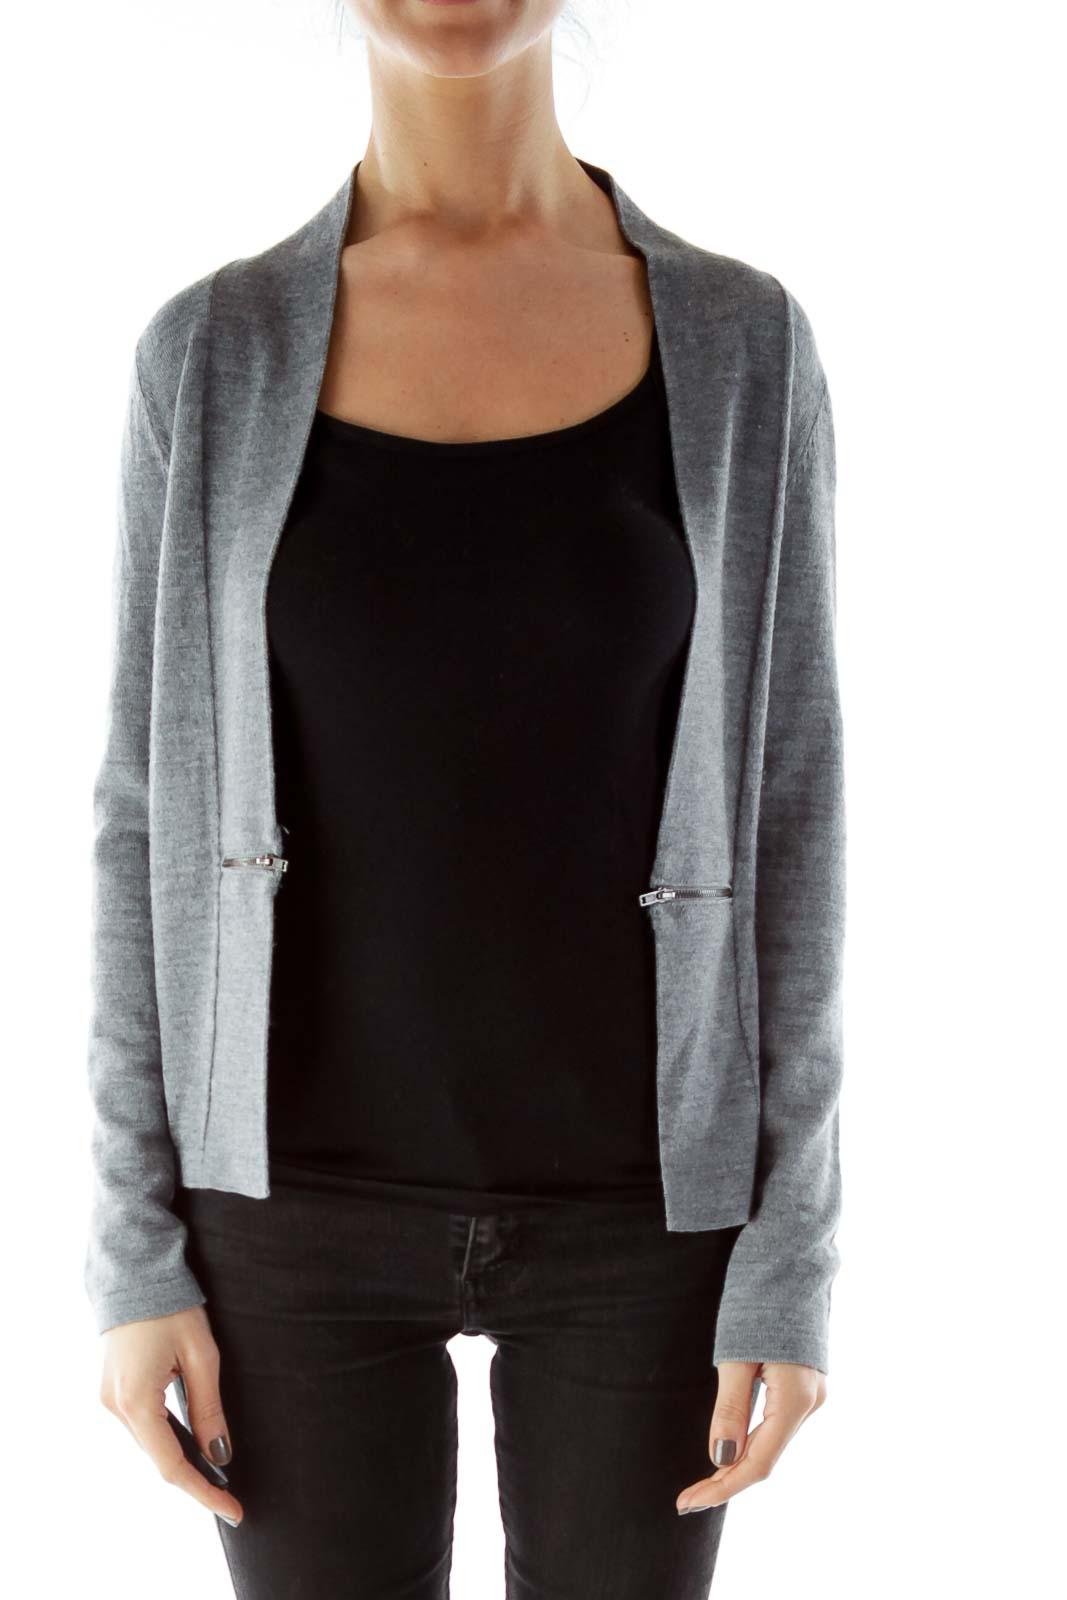 Gray Zippered Textured Open Cardigan